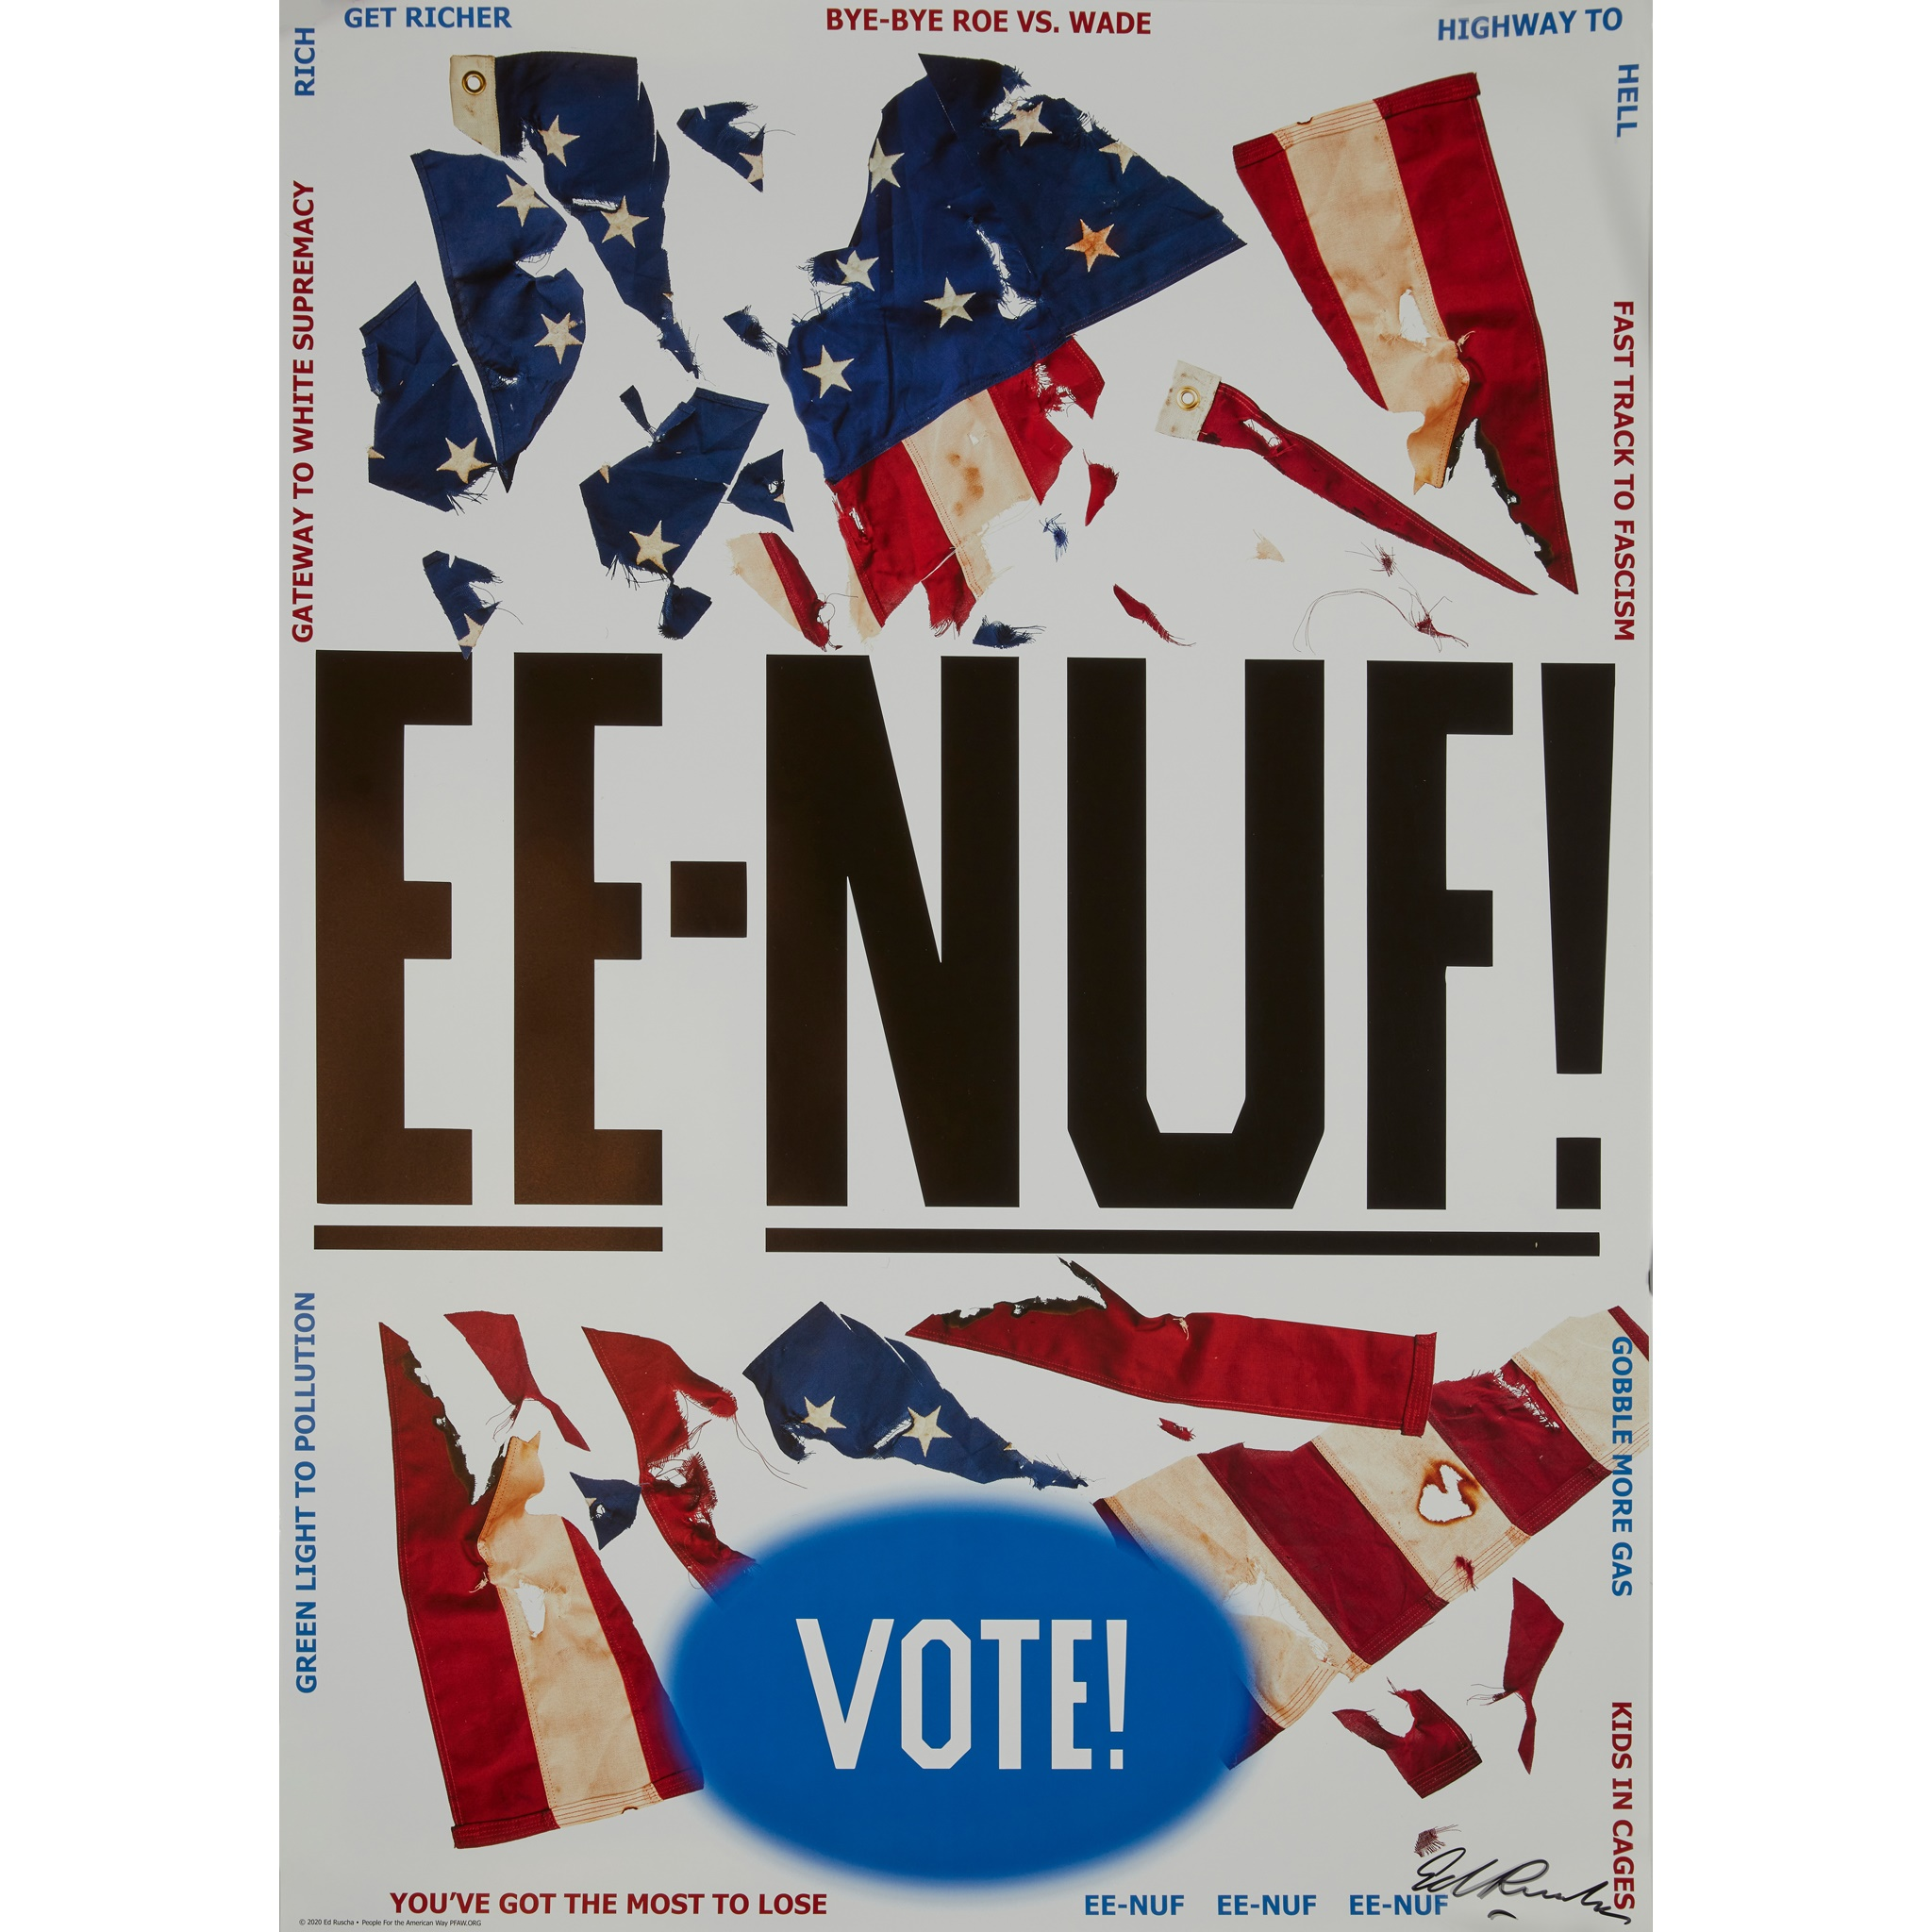 ED RUSCHA (AMERICAN 1937-) EE-NUF! - 2020